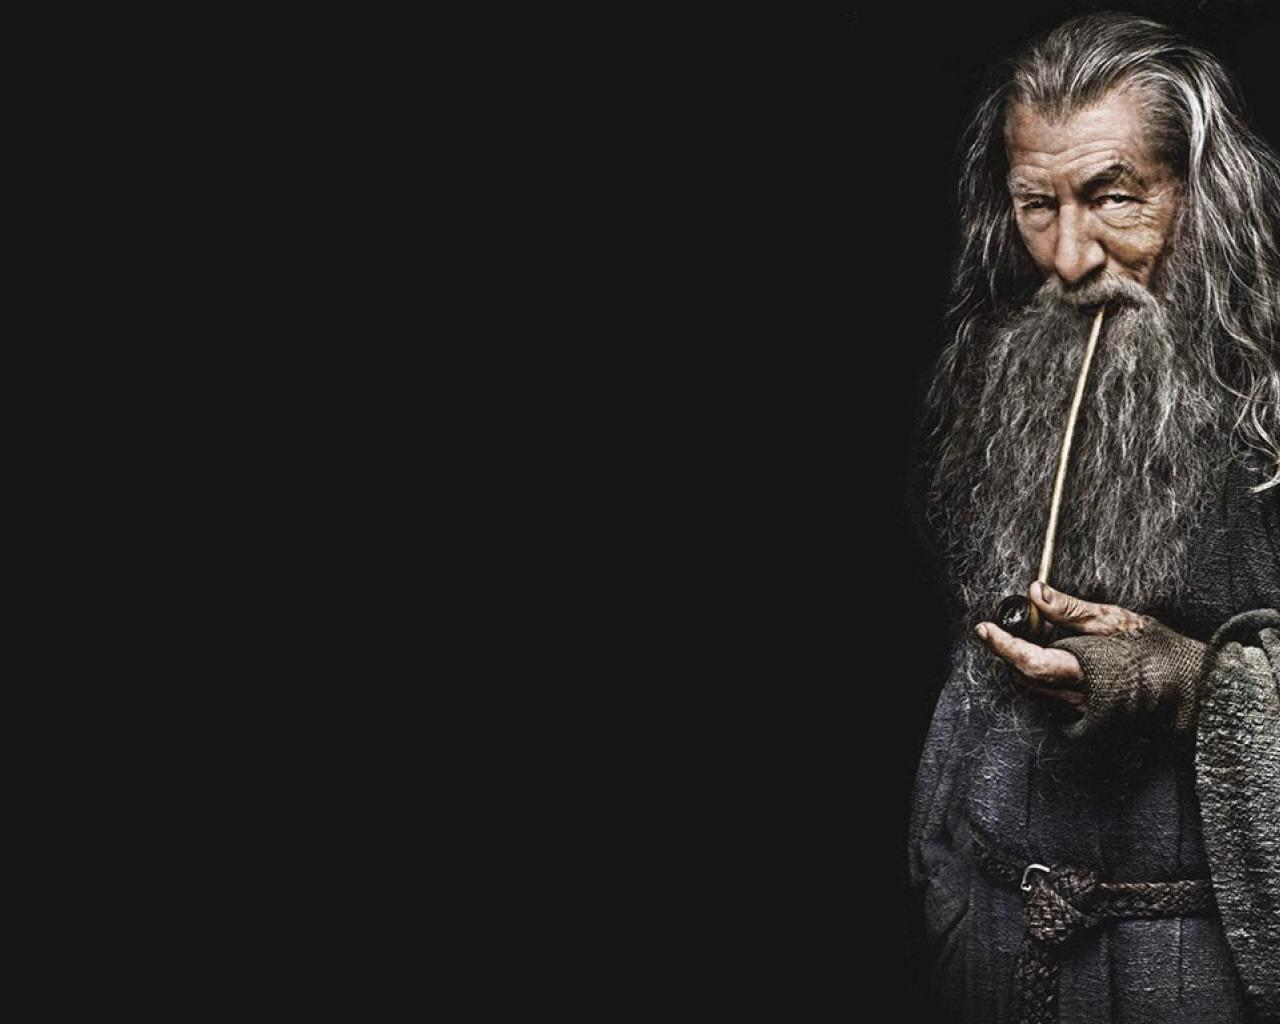 Gandalf Wallpaper 1280x1024